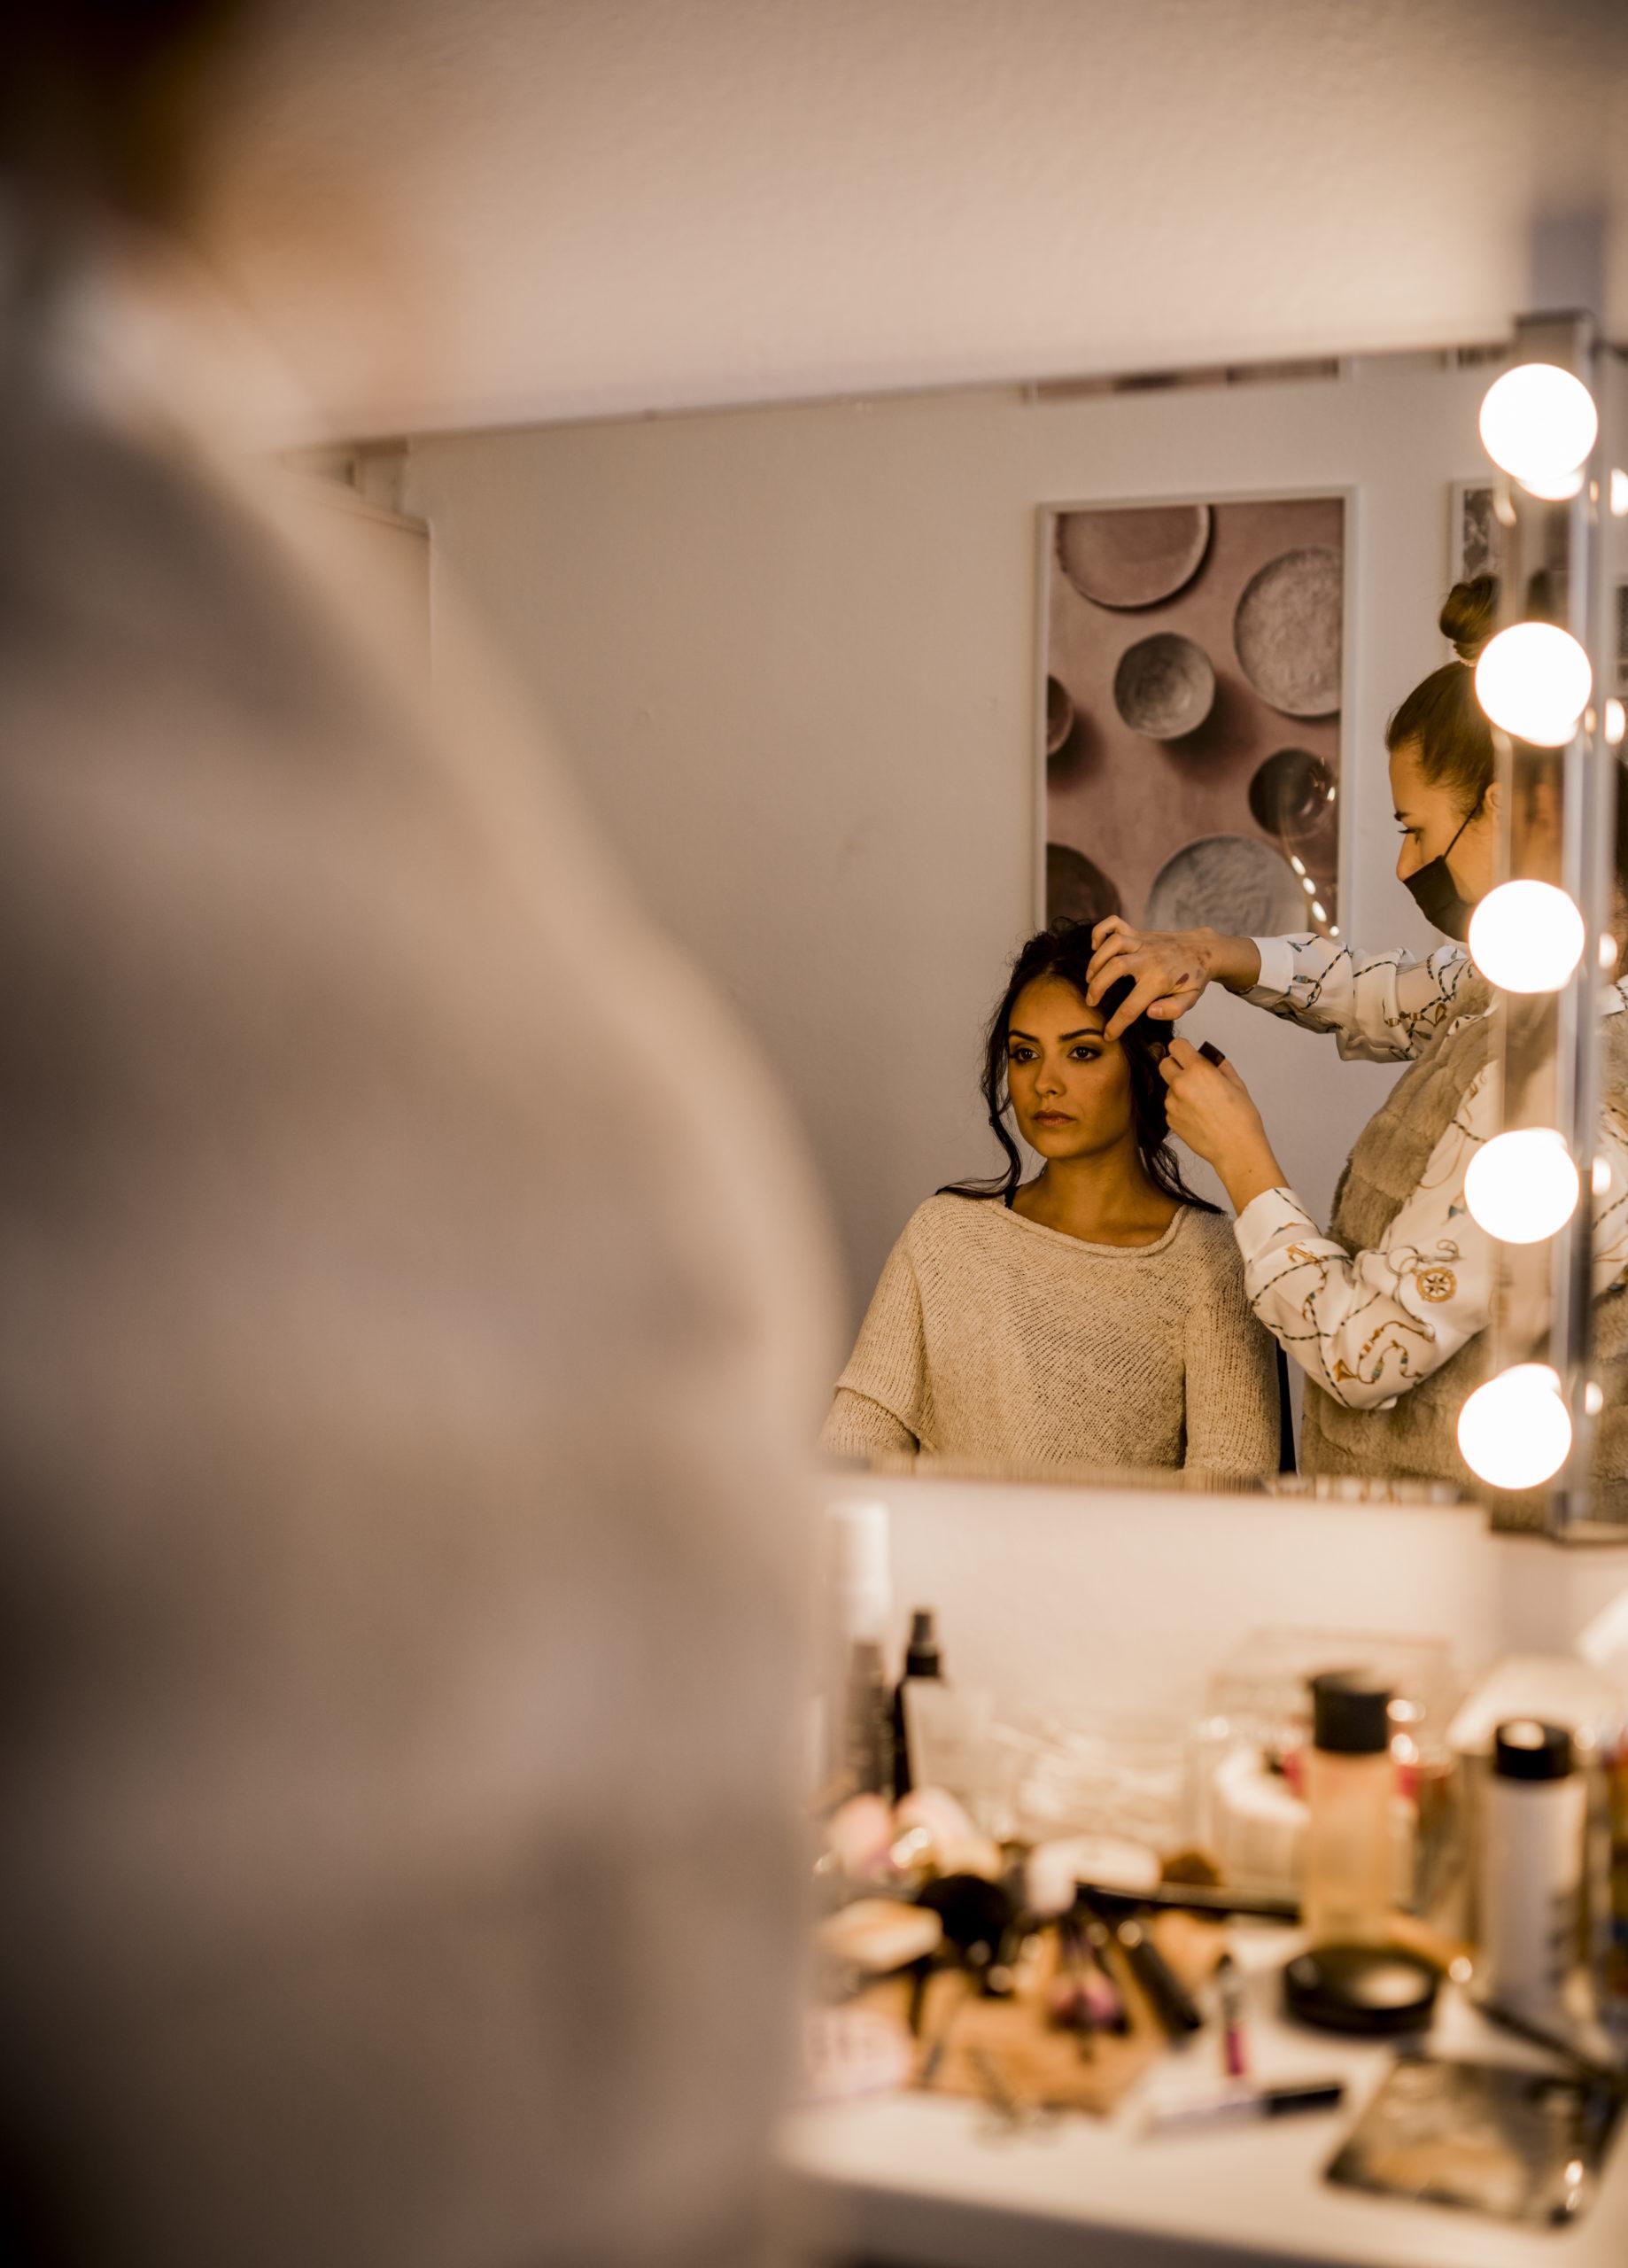 noni Brautmode, Styled Shoot, Getting Ready, Model am Schminktisch mit Stylistin